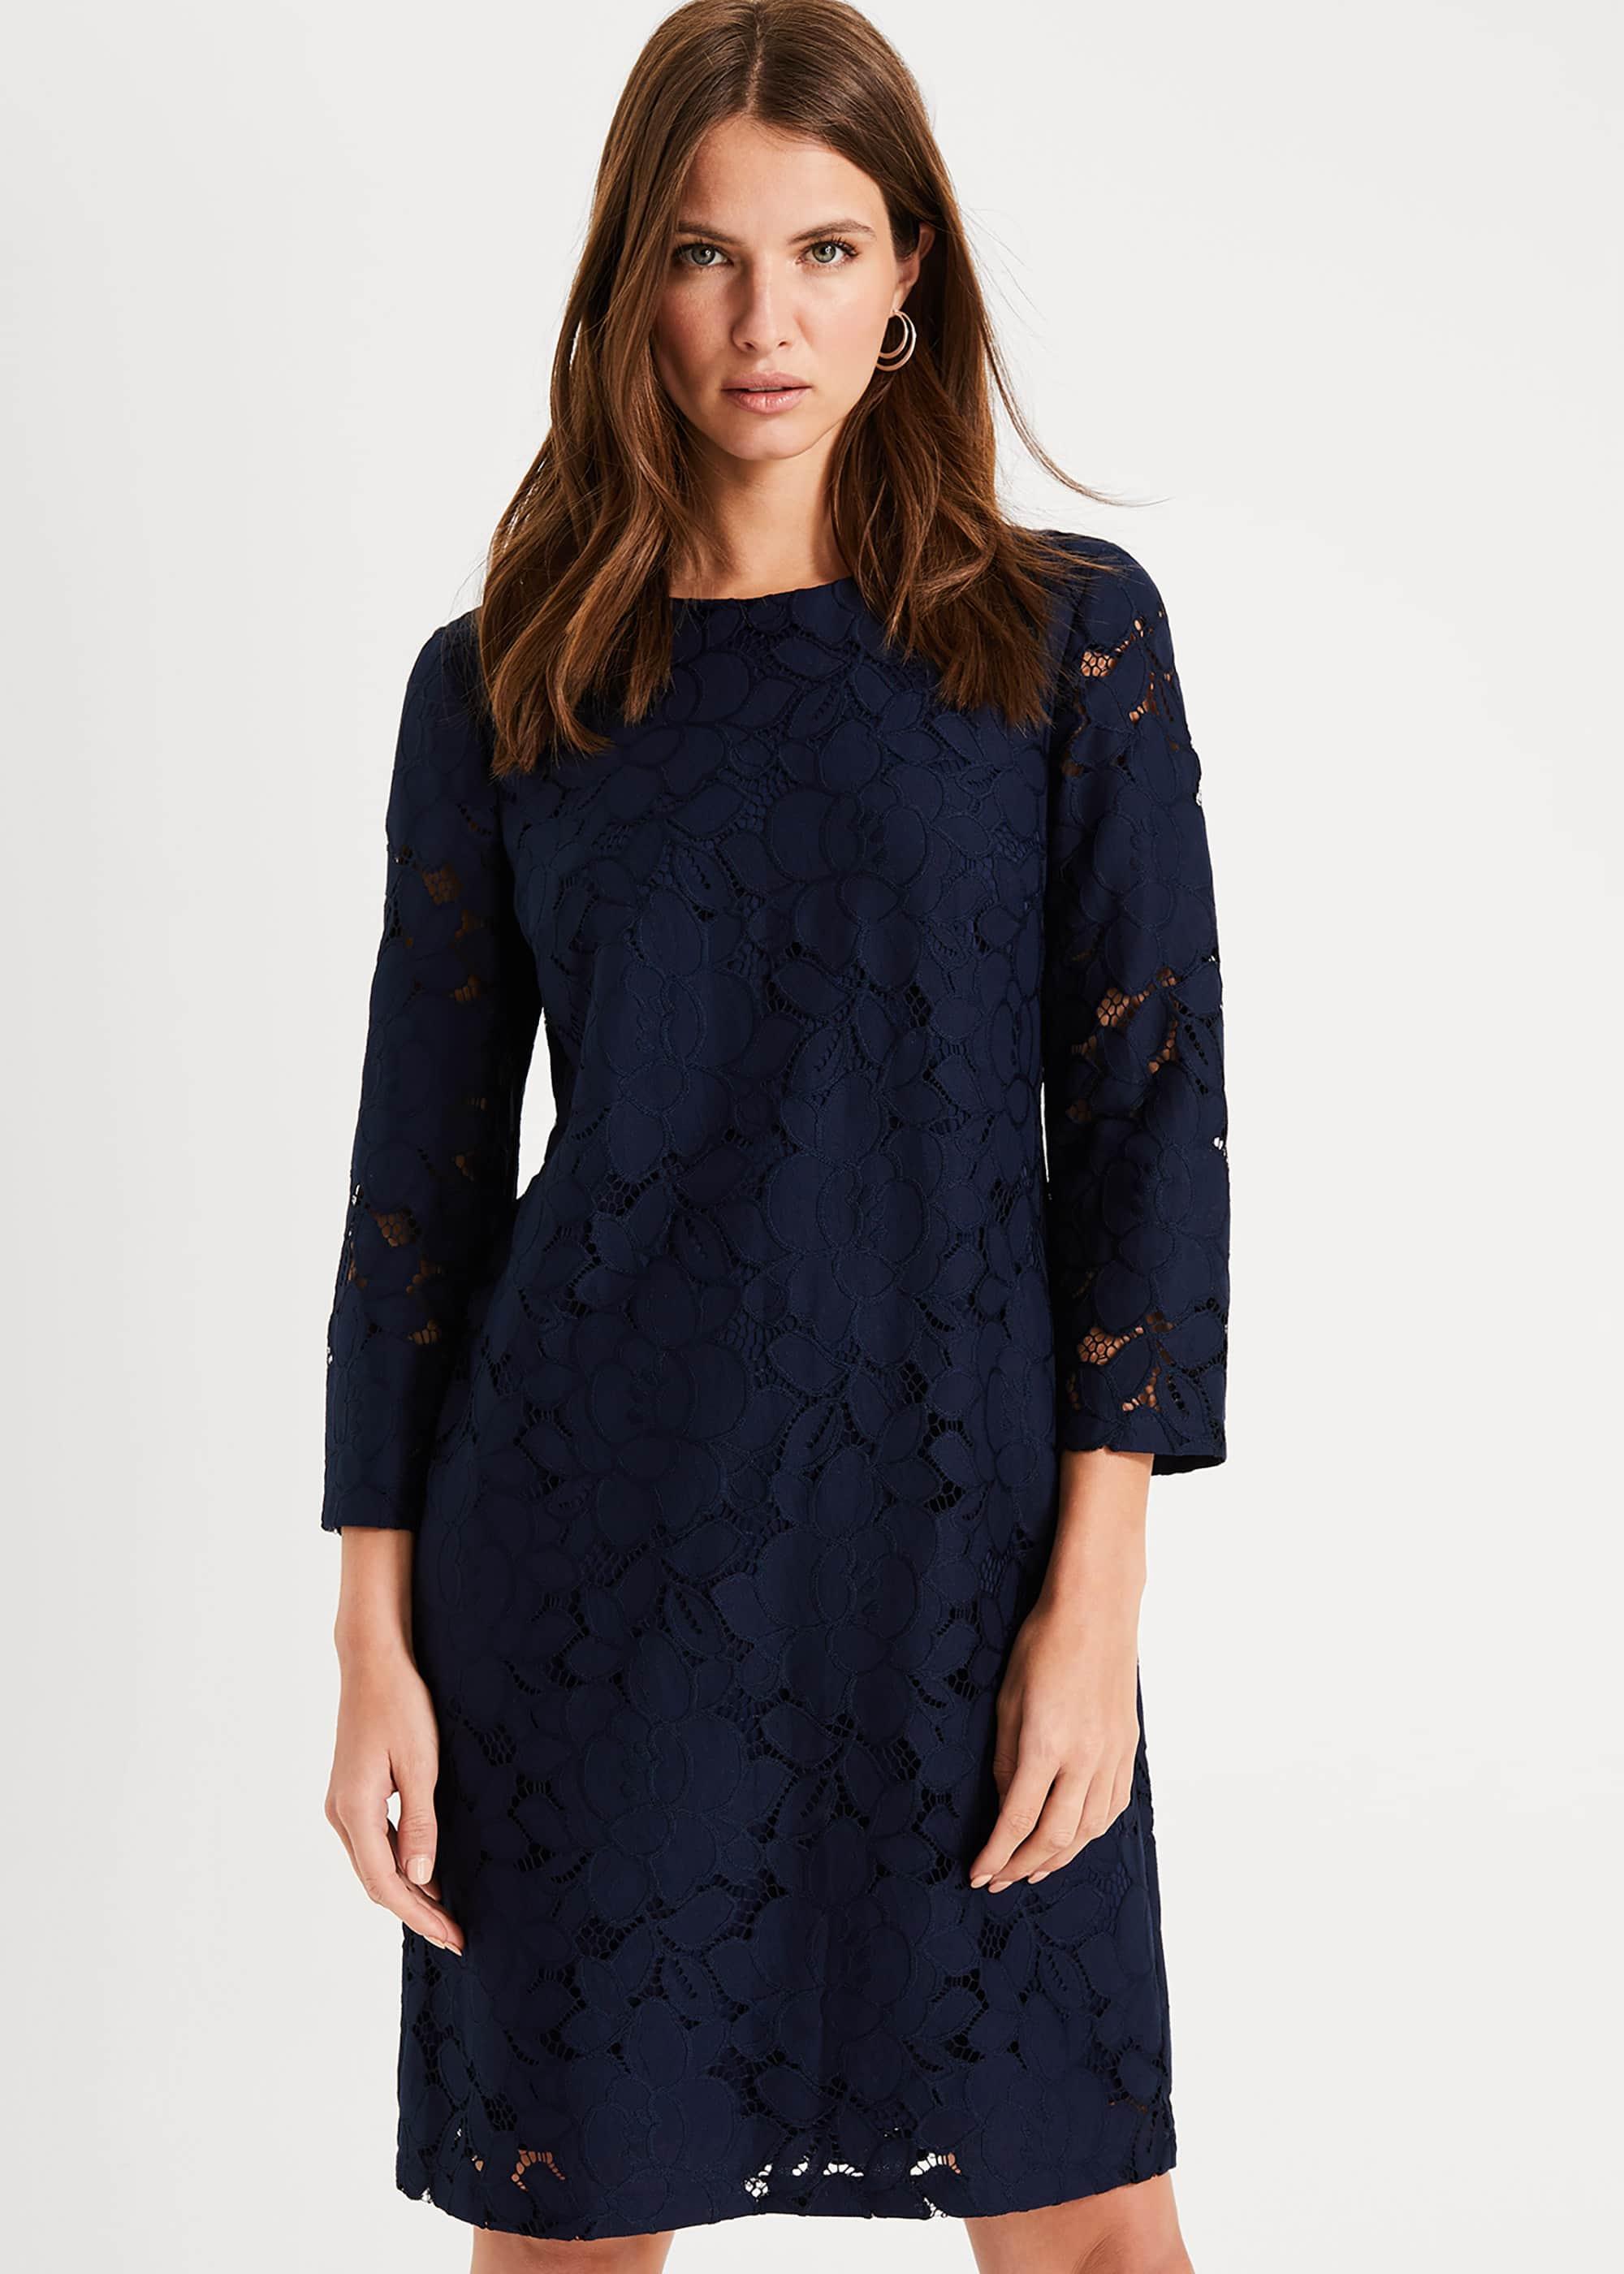 Phase Eight Women Kacie Lace Shift Dress